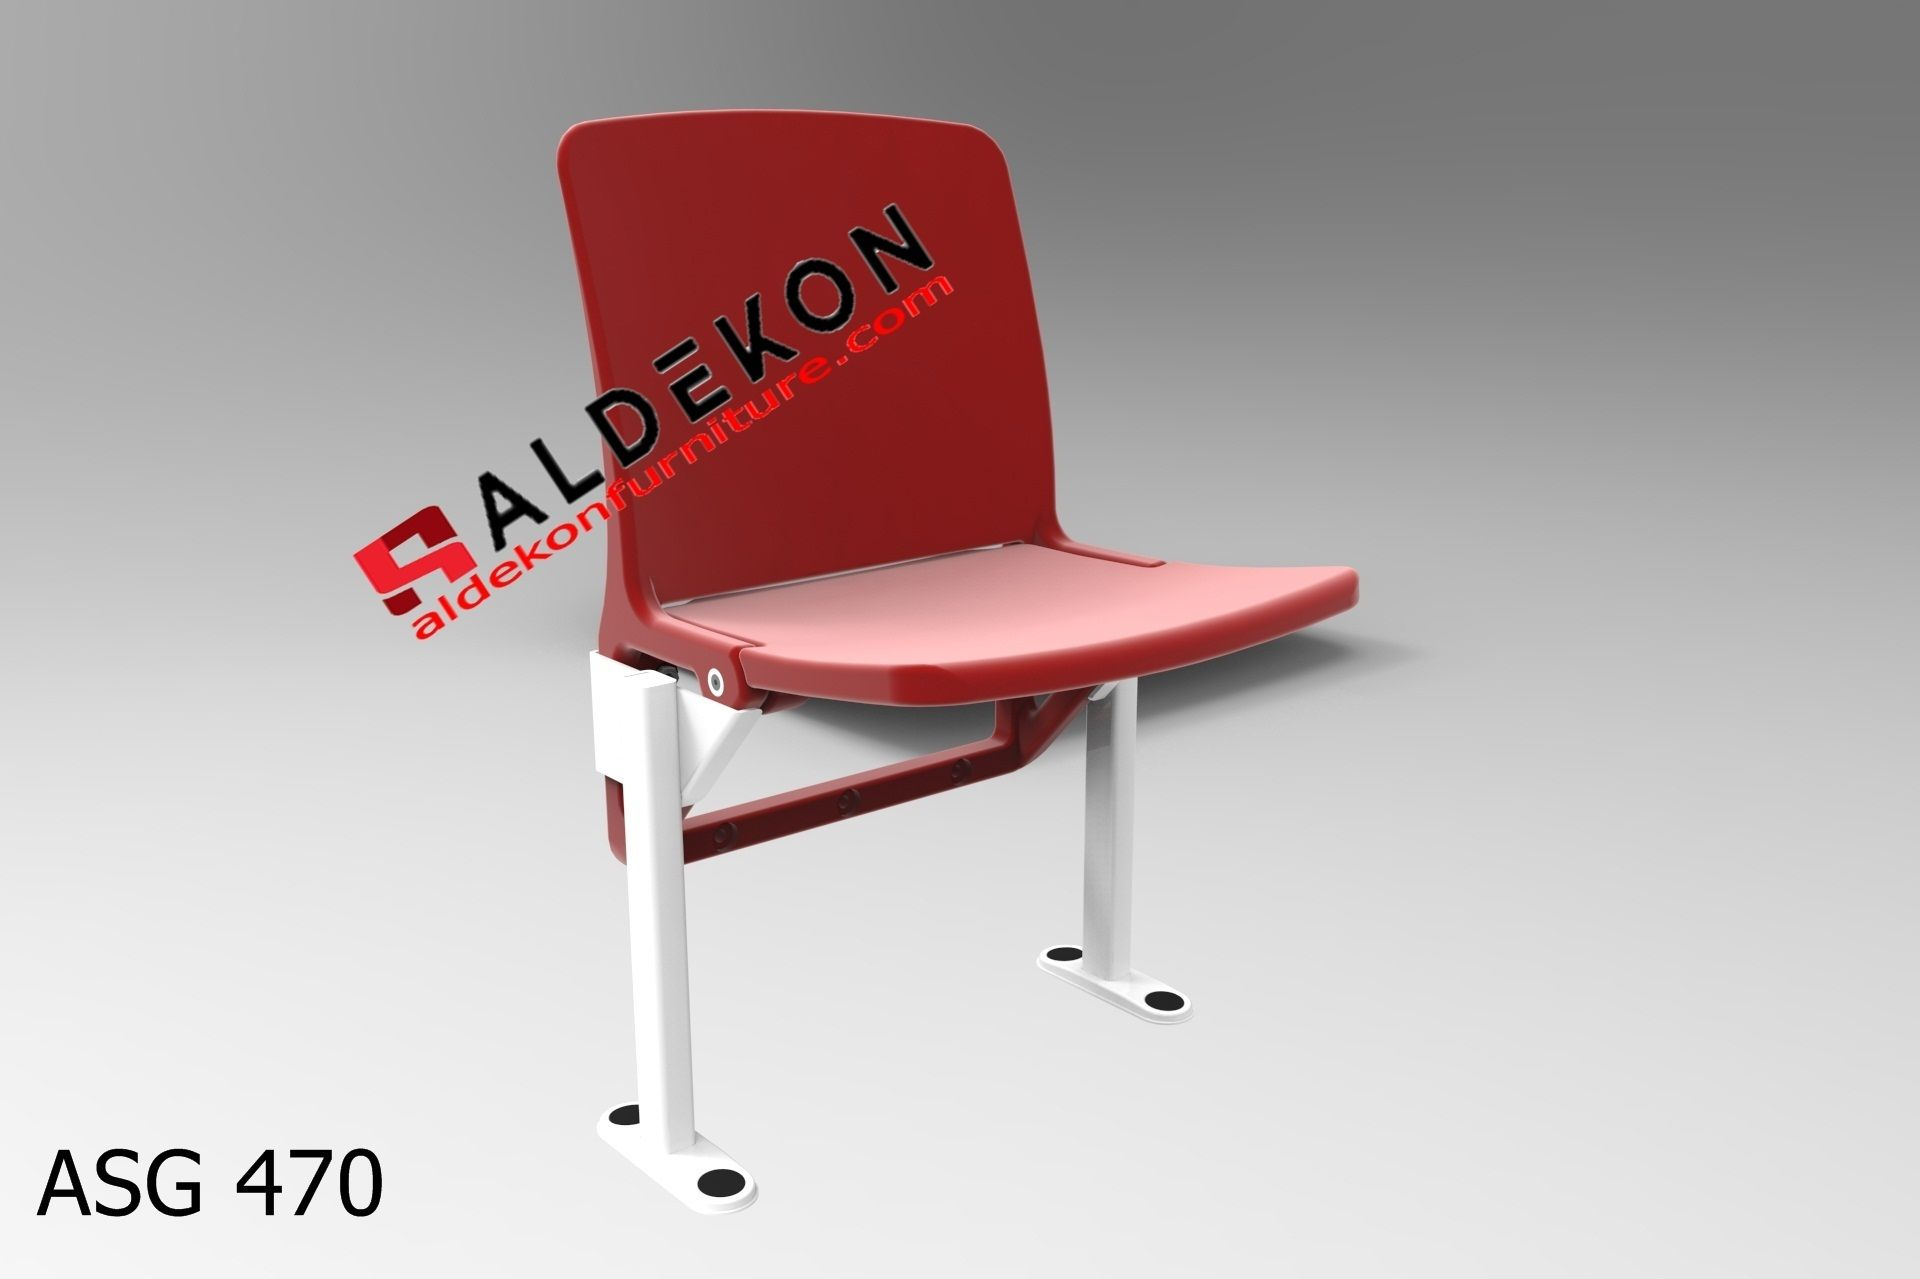 24 bleacher chairs with arms 5 0 10 stadium chair stadium